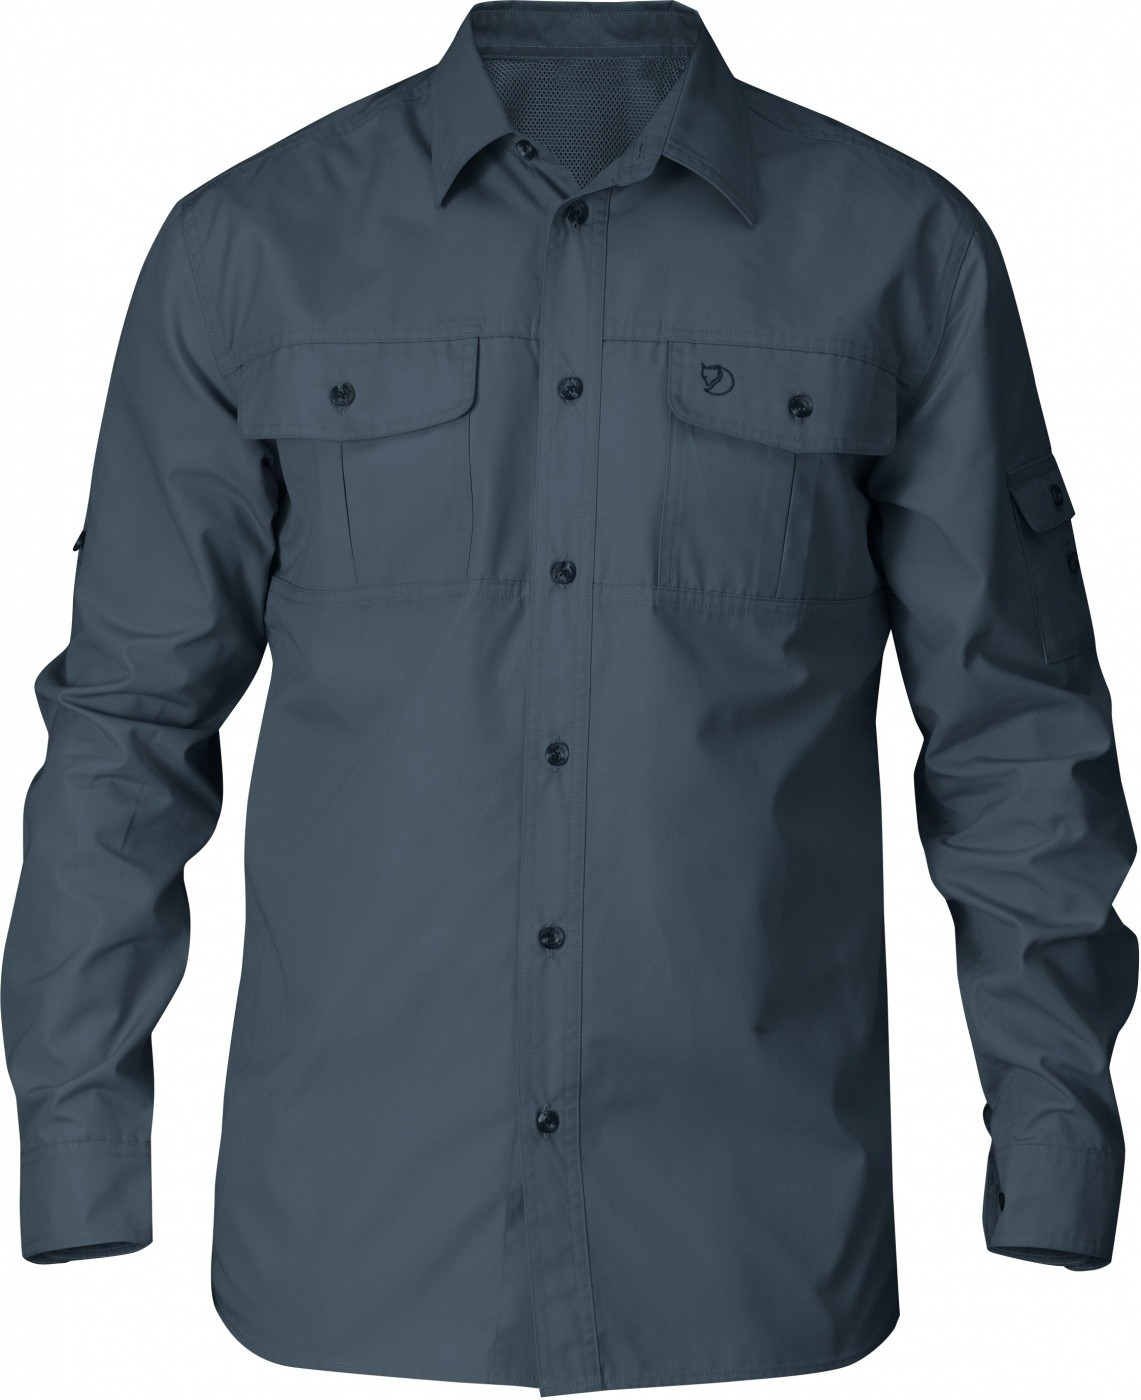 FjallRaven Singi Trekking Shirt LS